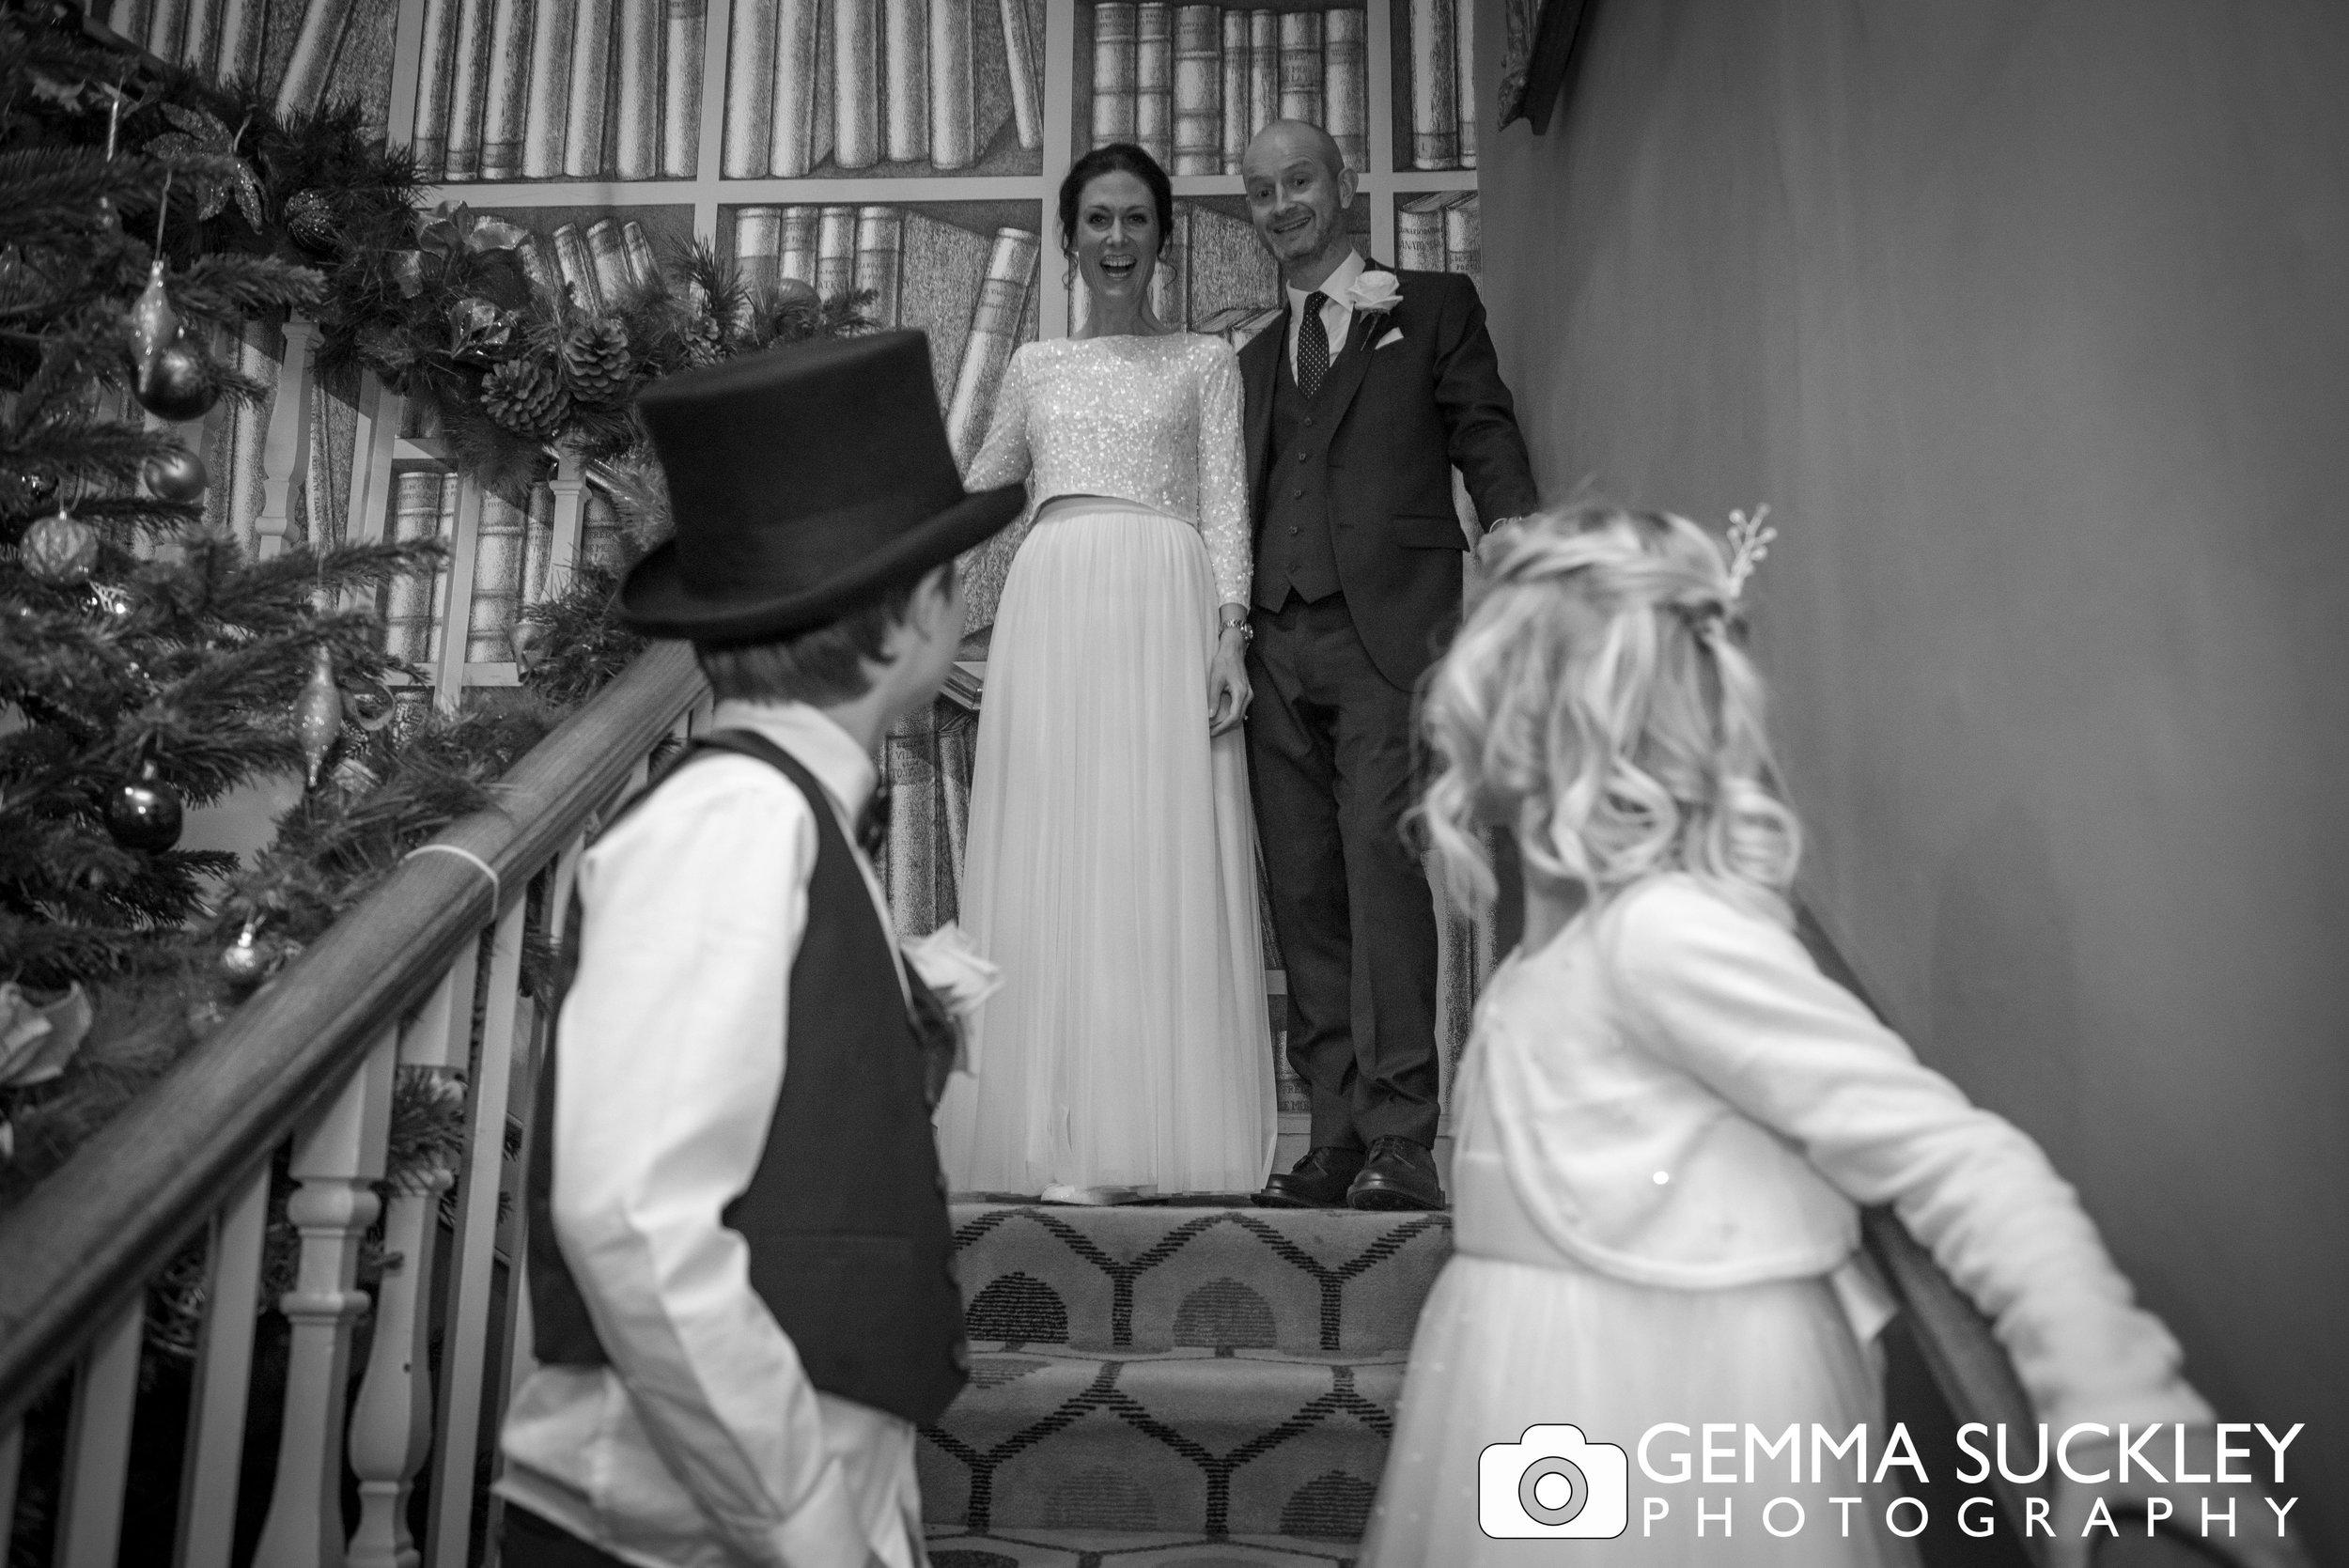 devonshire-arms-wedding-photographer.jpg